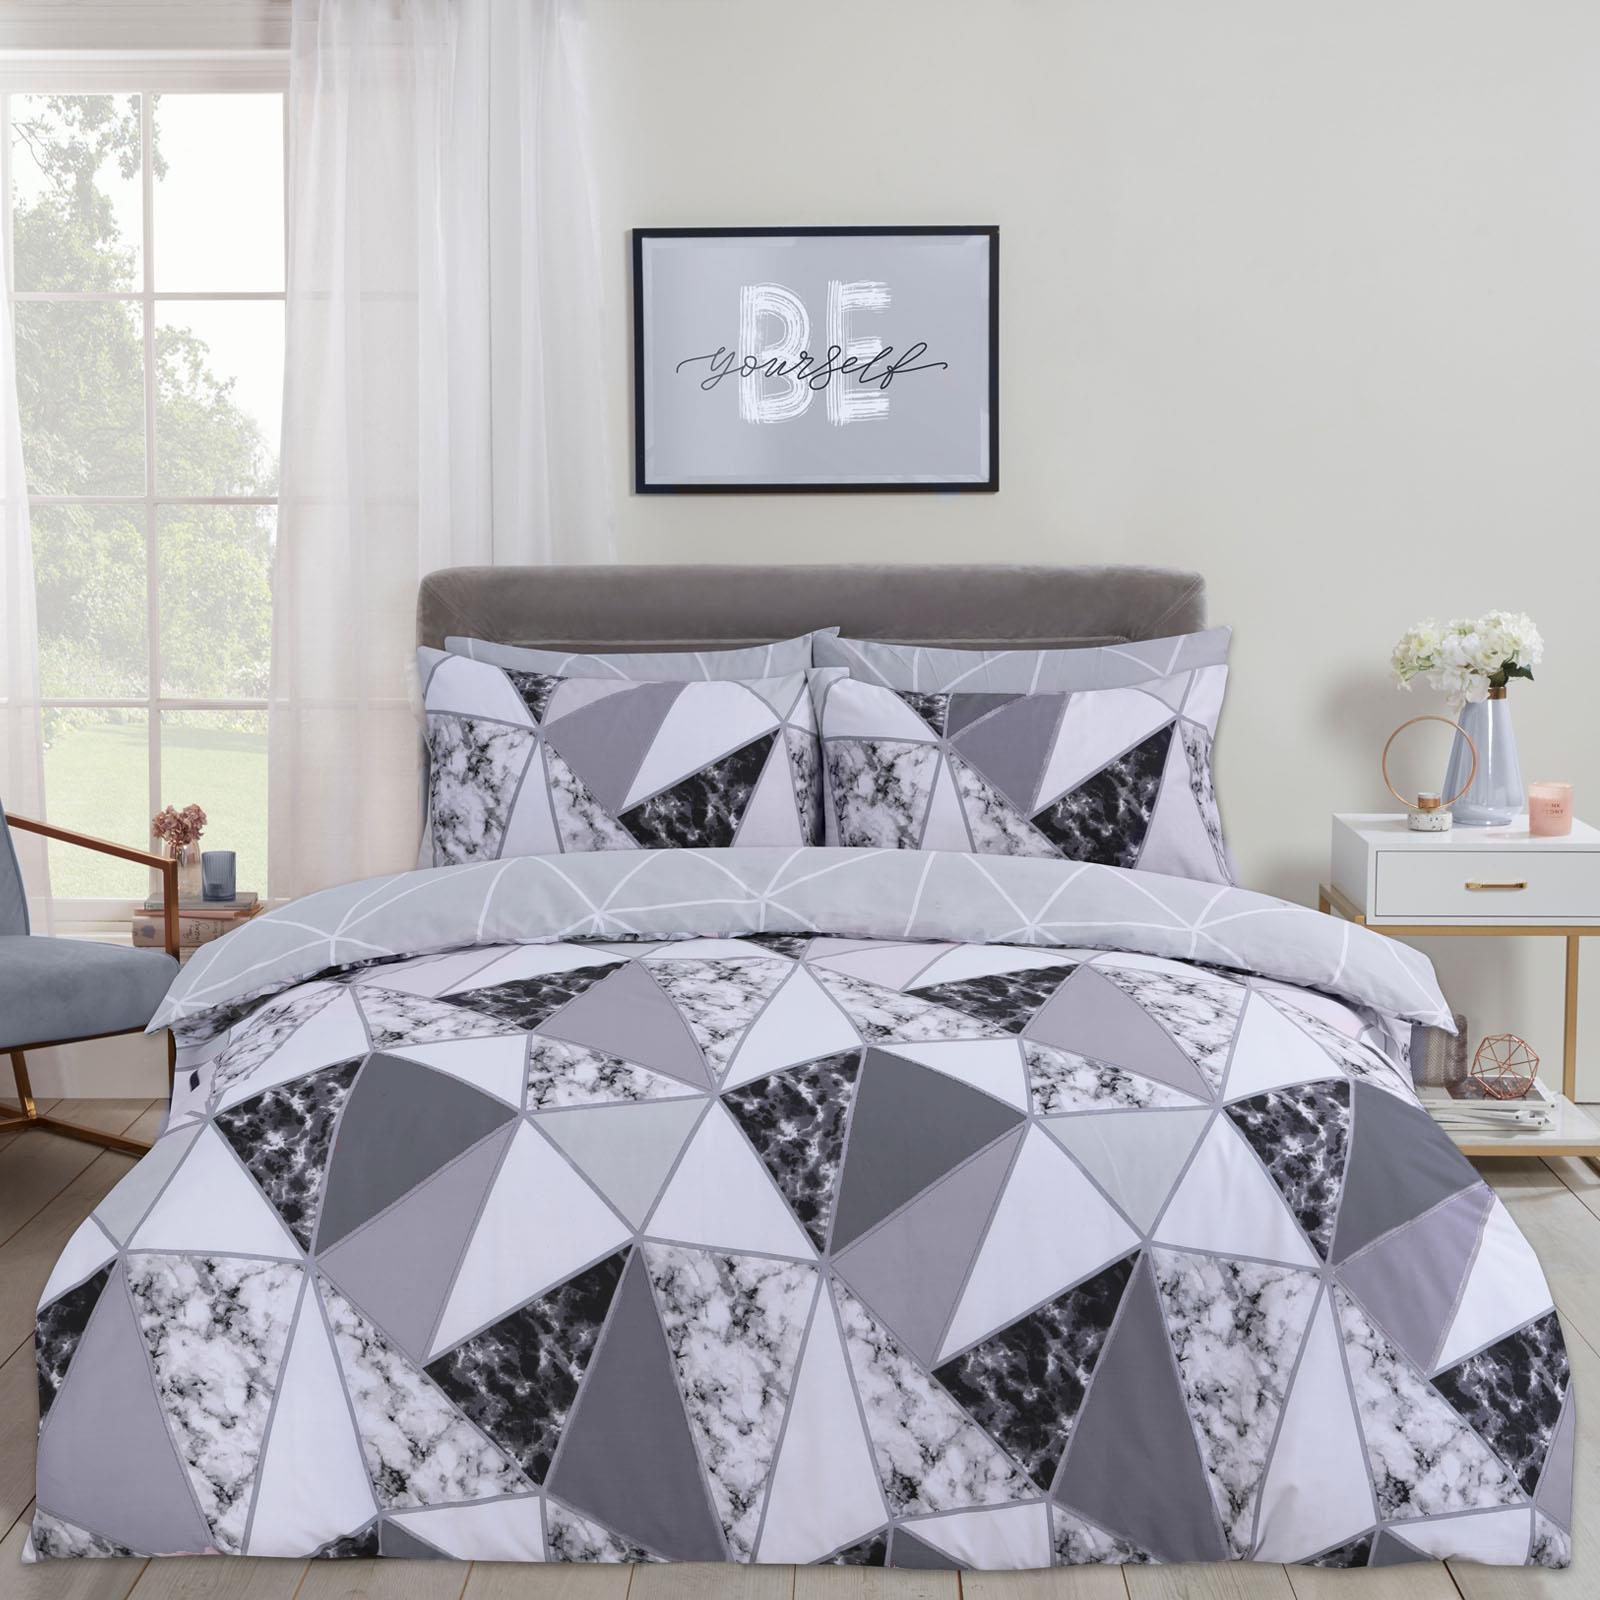 thumbnail 14 - Dreamscene Marble Geometric Duvet Cover with Pillowcase Bedding Set Grey Blush